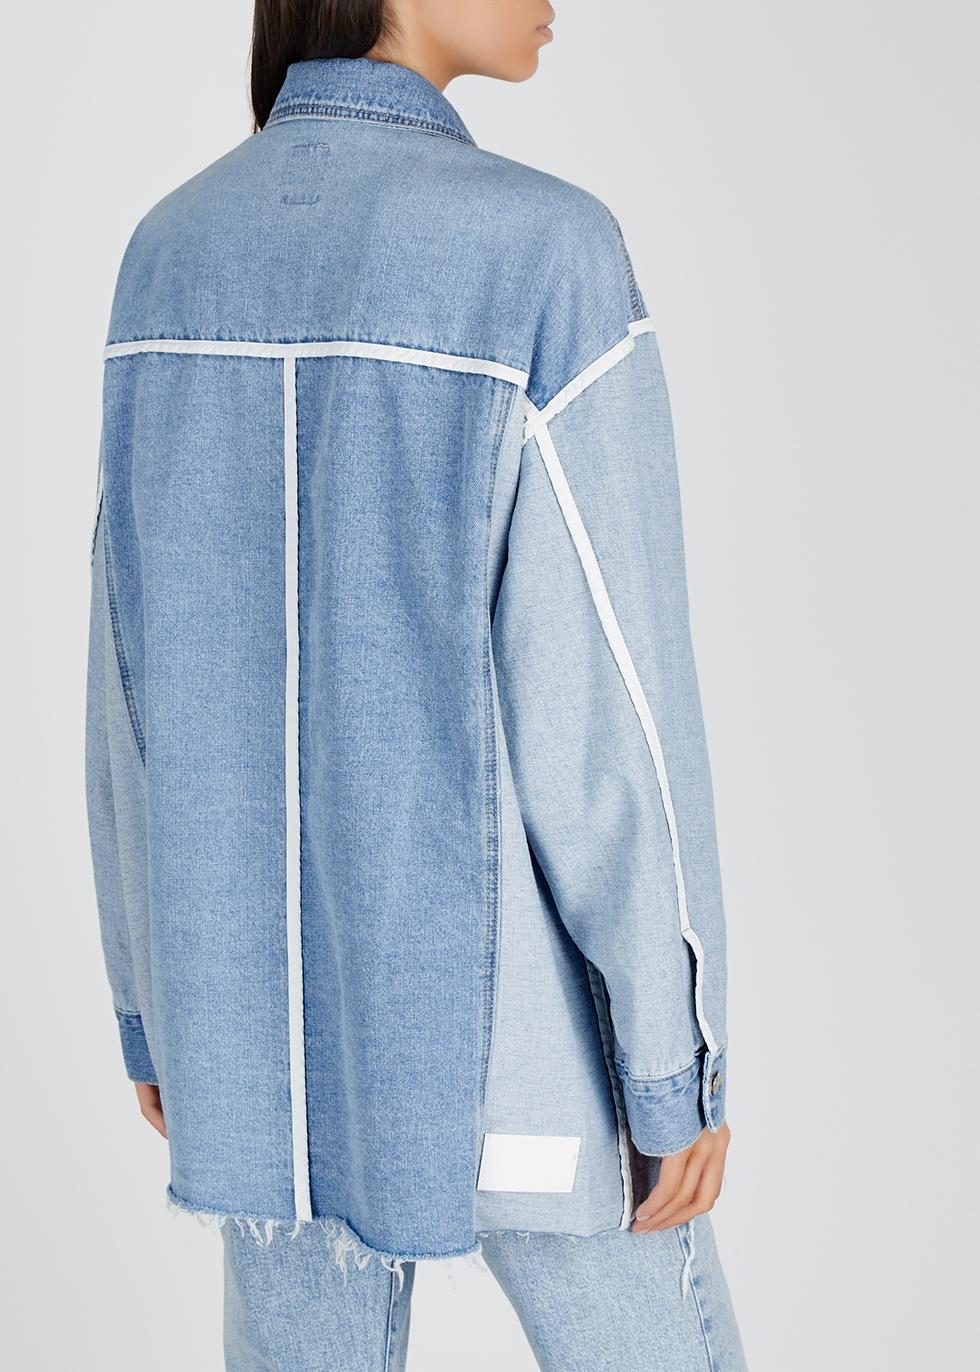 Two-tone panelled denim shirt - SJYP